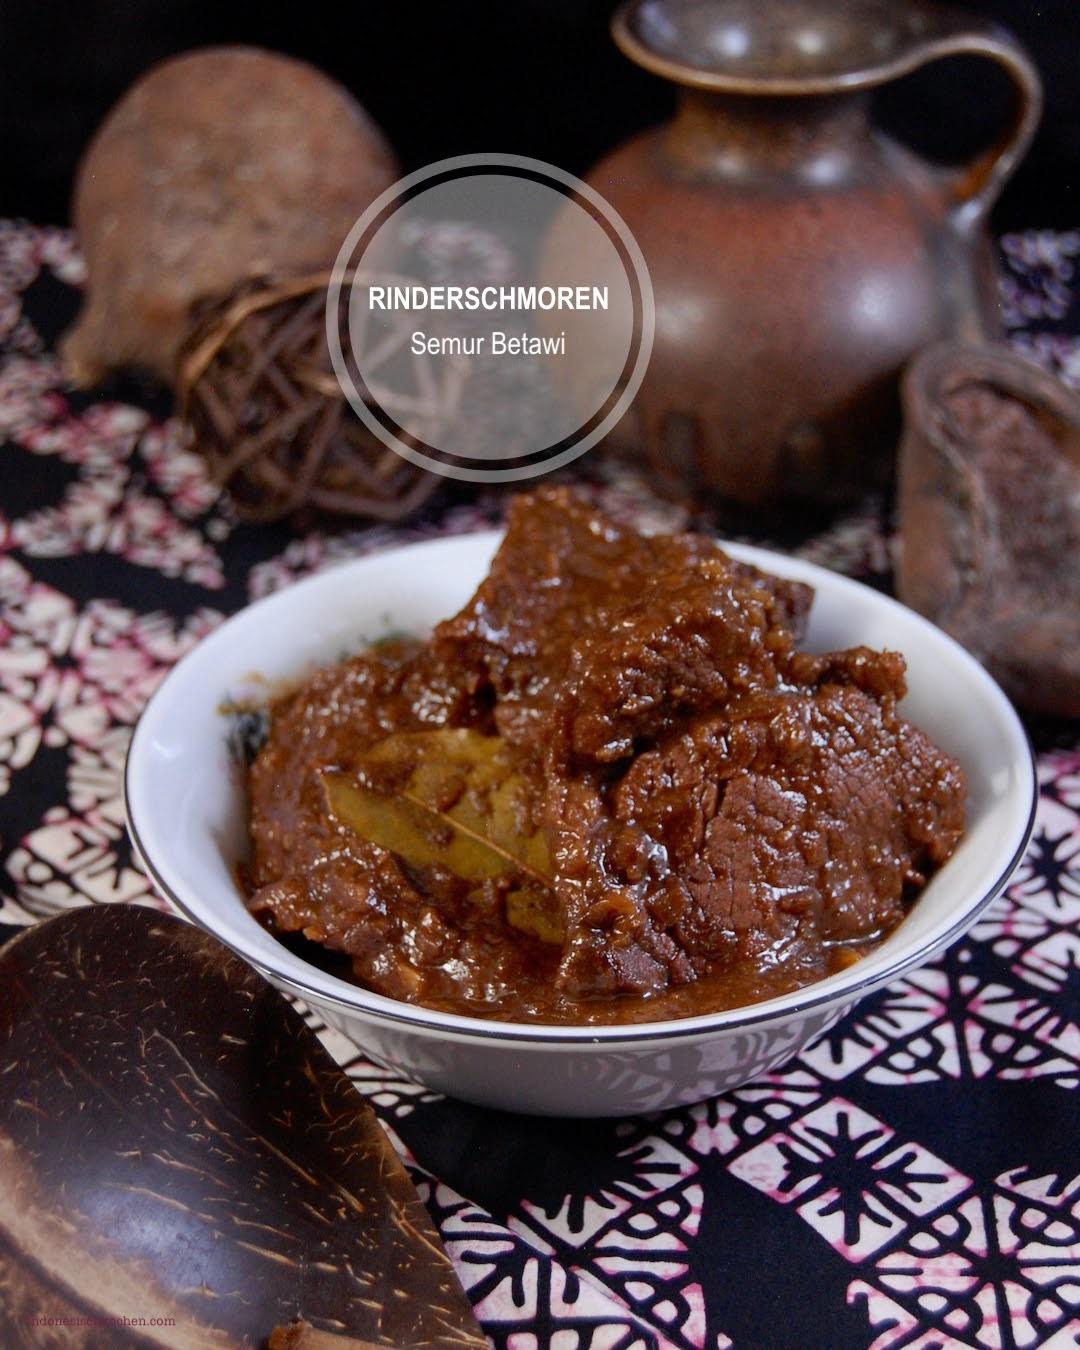 Rezept Rinderschmorbraten im Topf nach Jakarta-Art